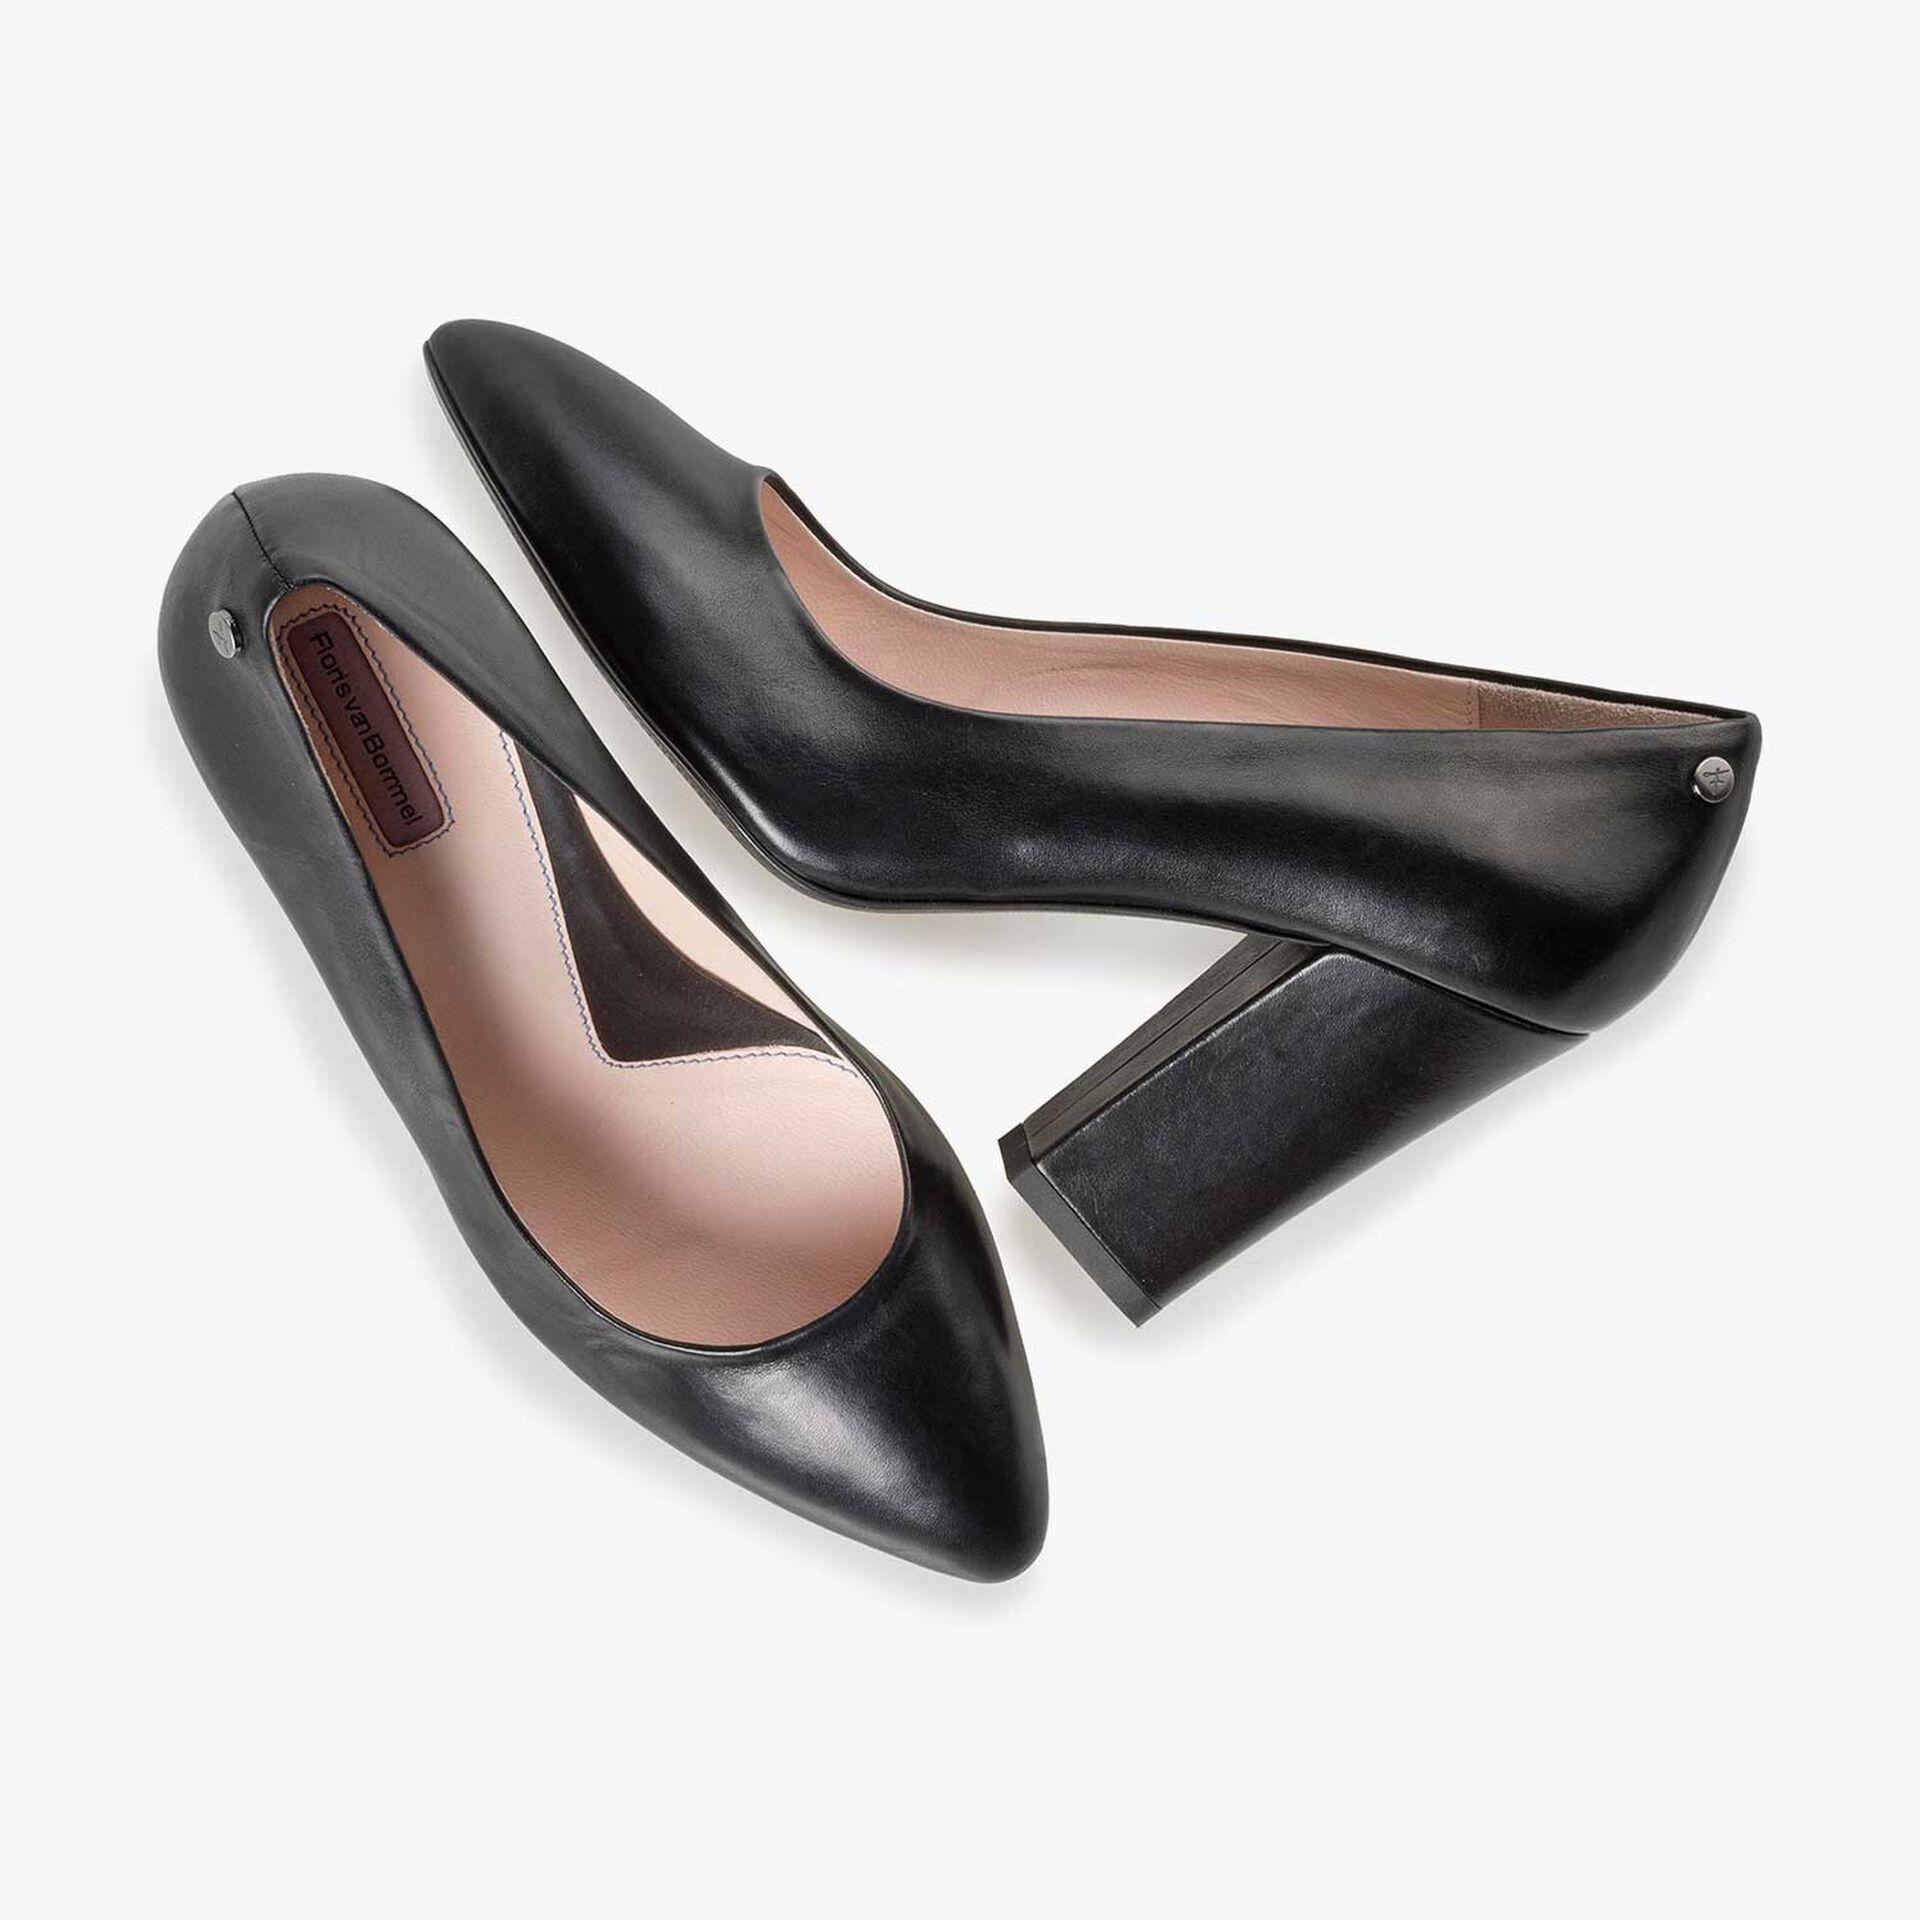 Black calf leather high heels